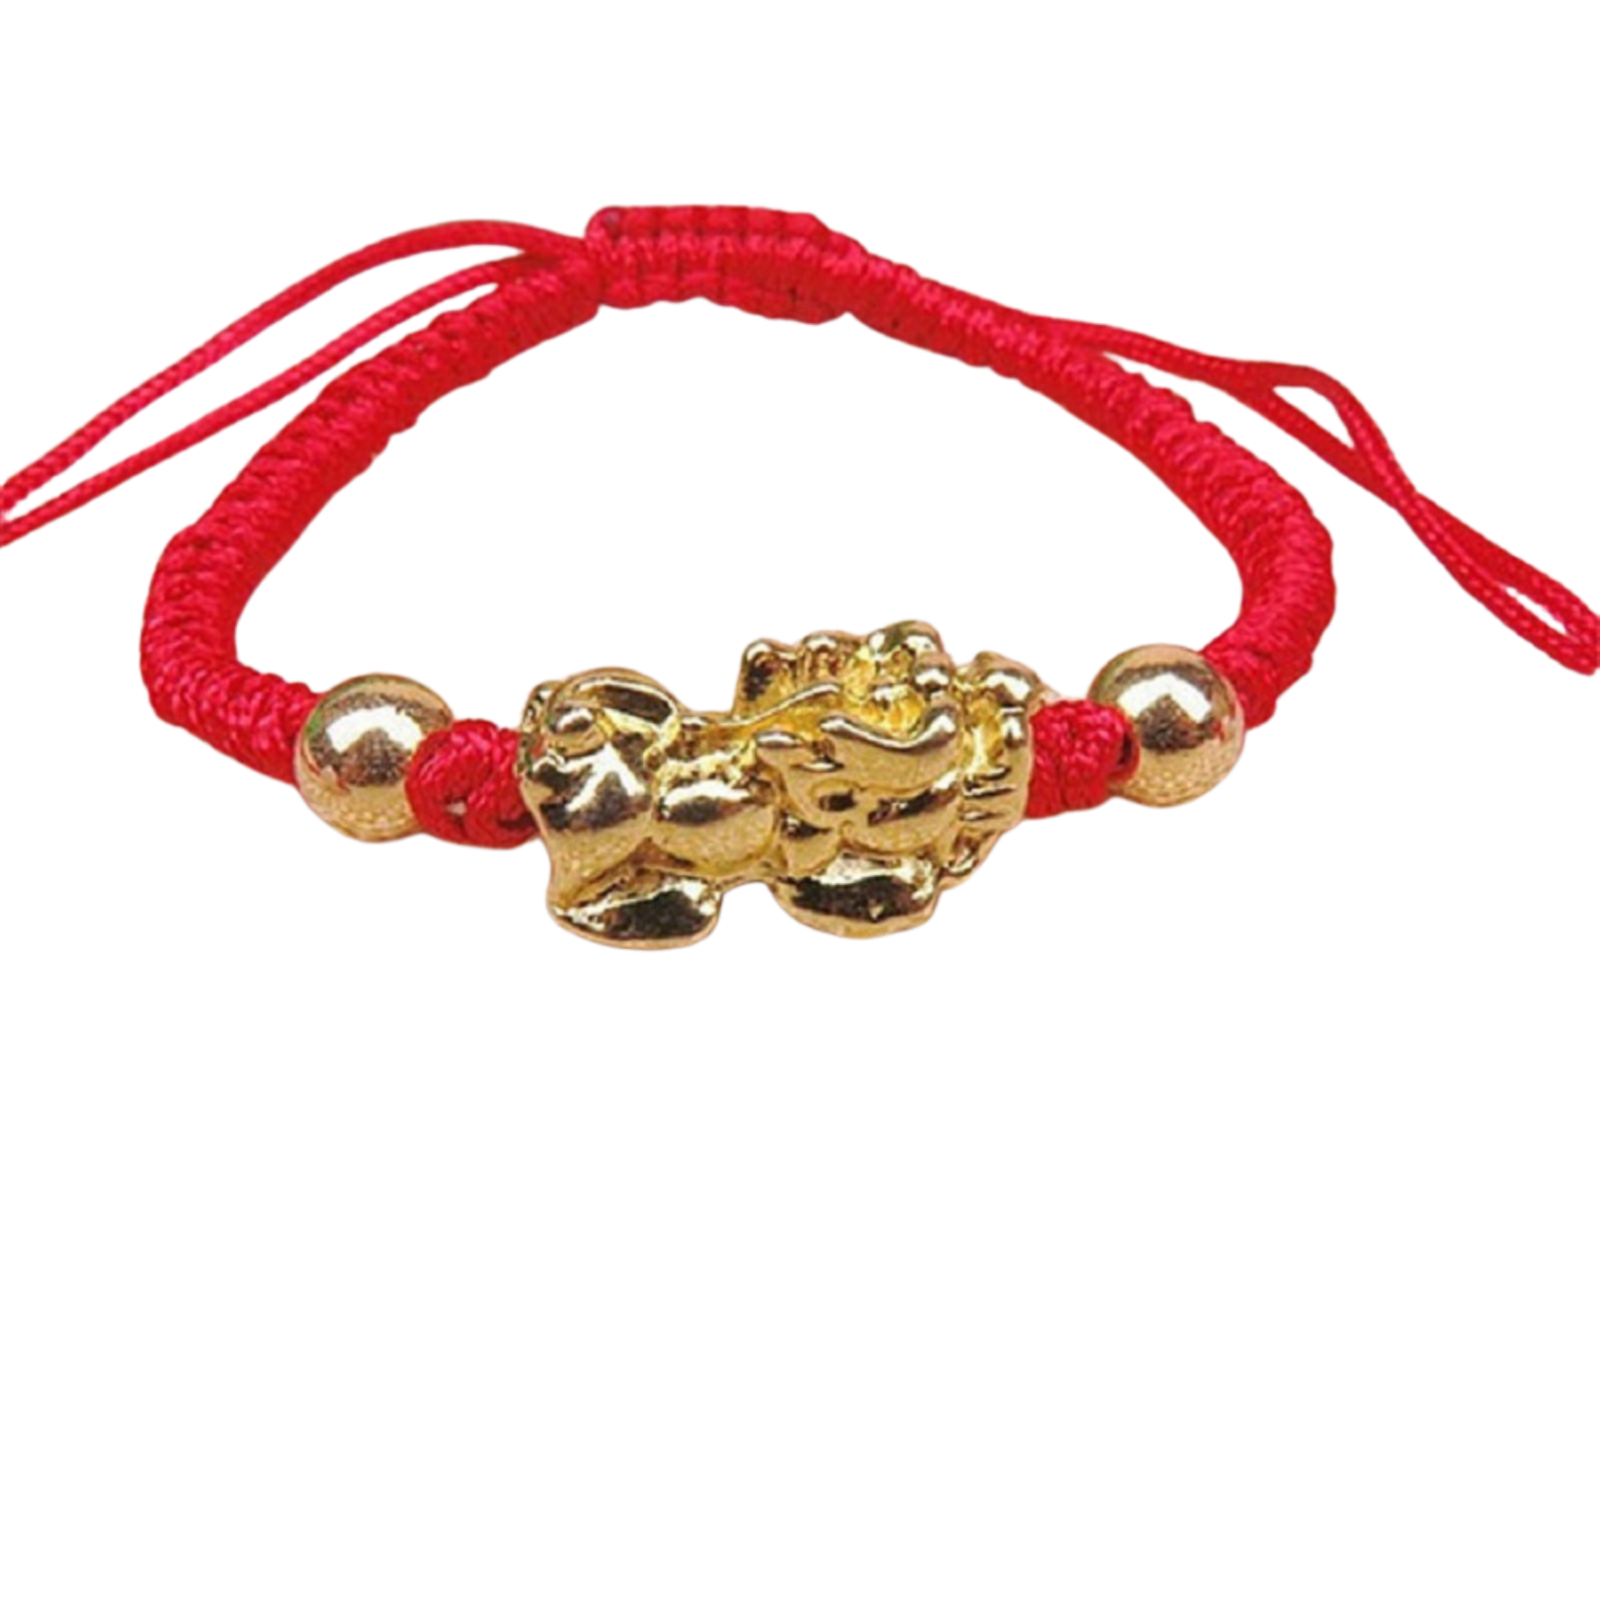 Fashion Unisex Agate Beads Pi Xiu Bracelet Wealth Bracelets Good Luck